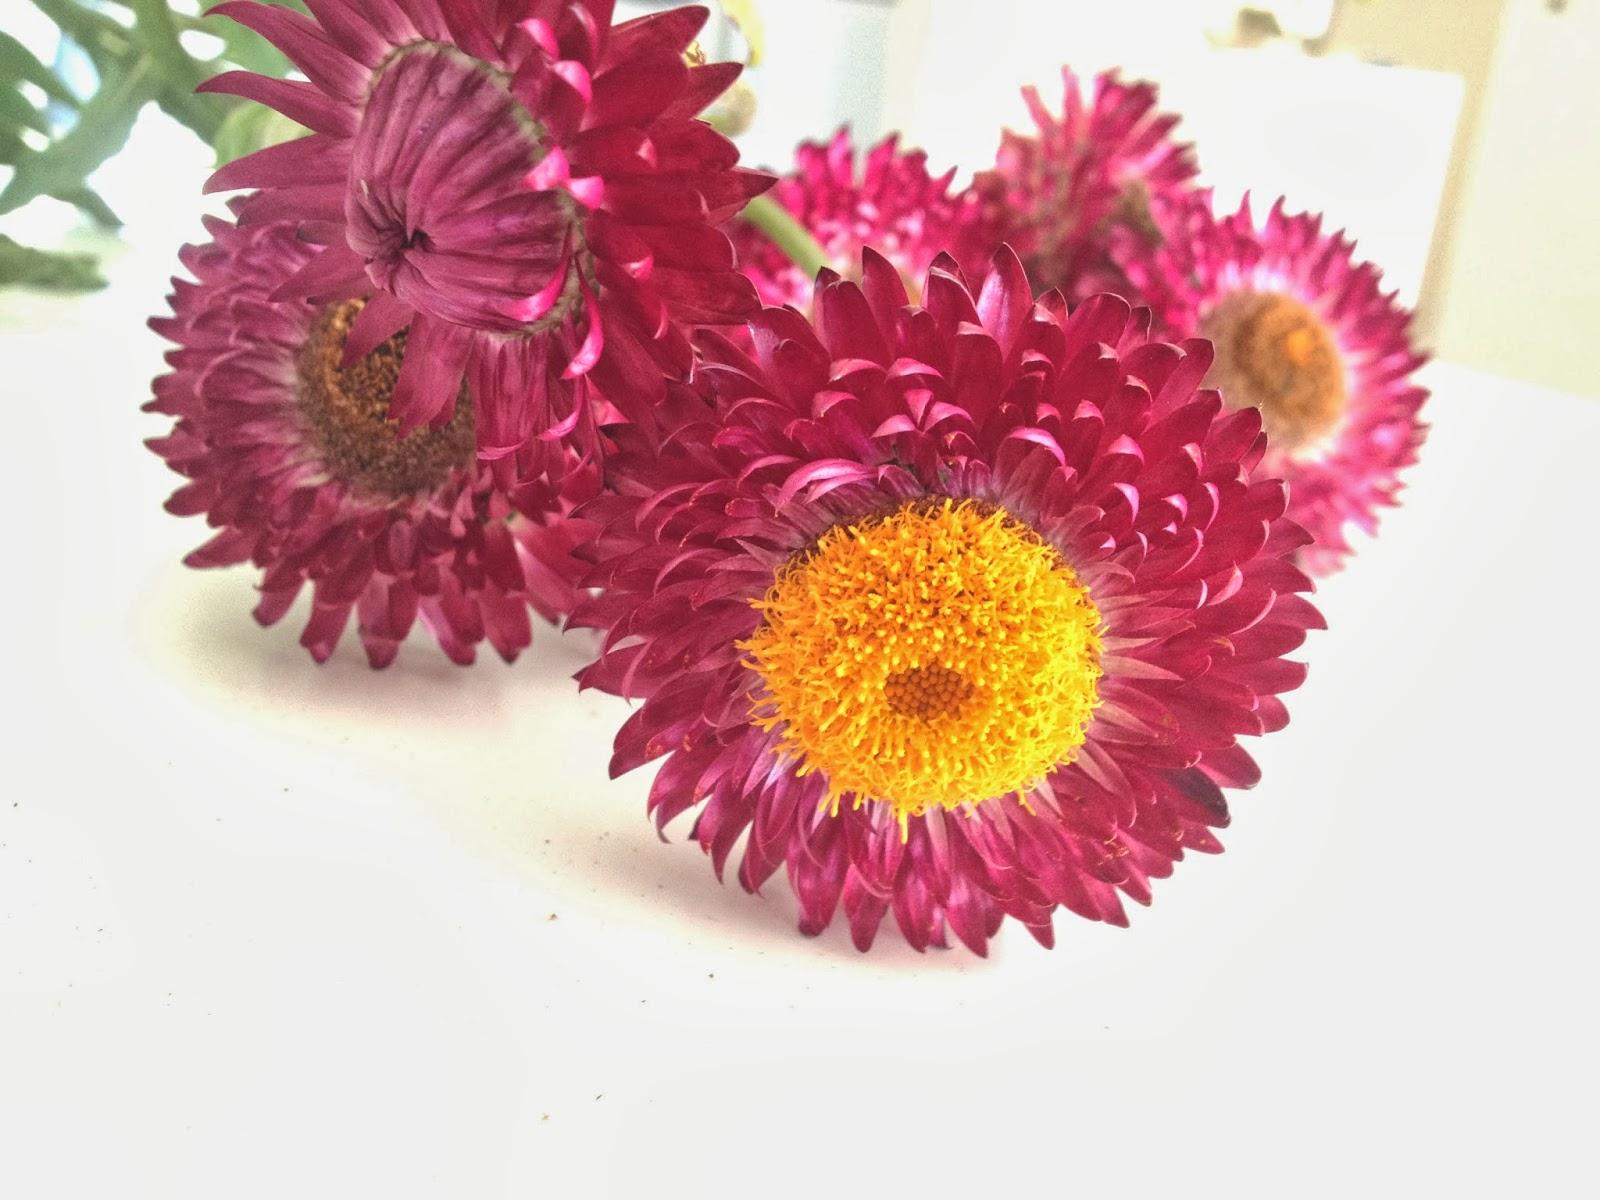 Tørkede blomster